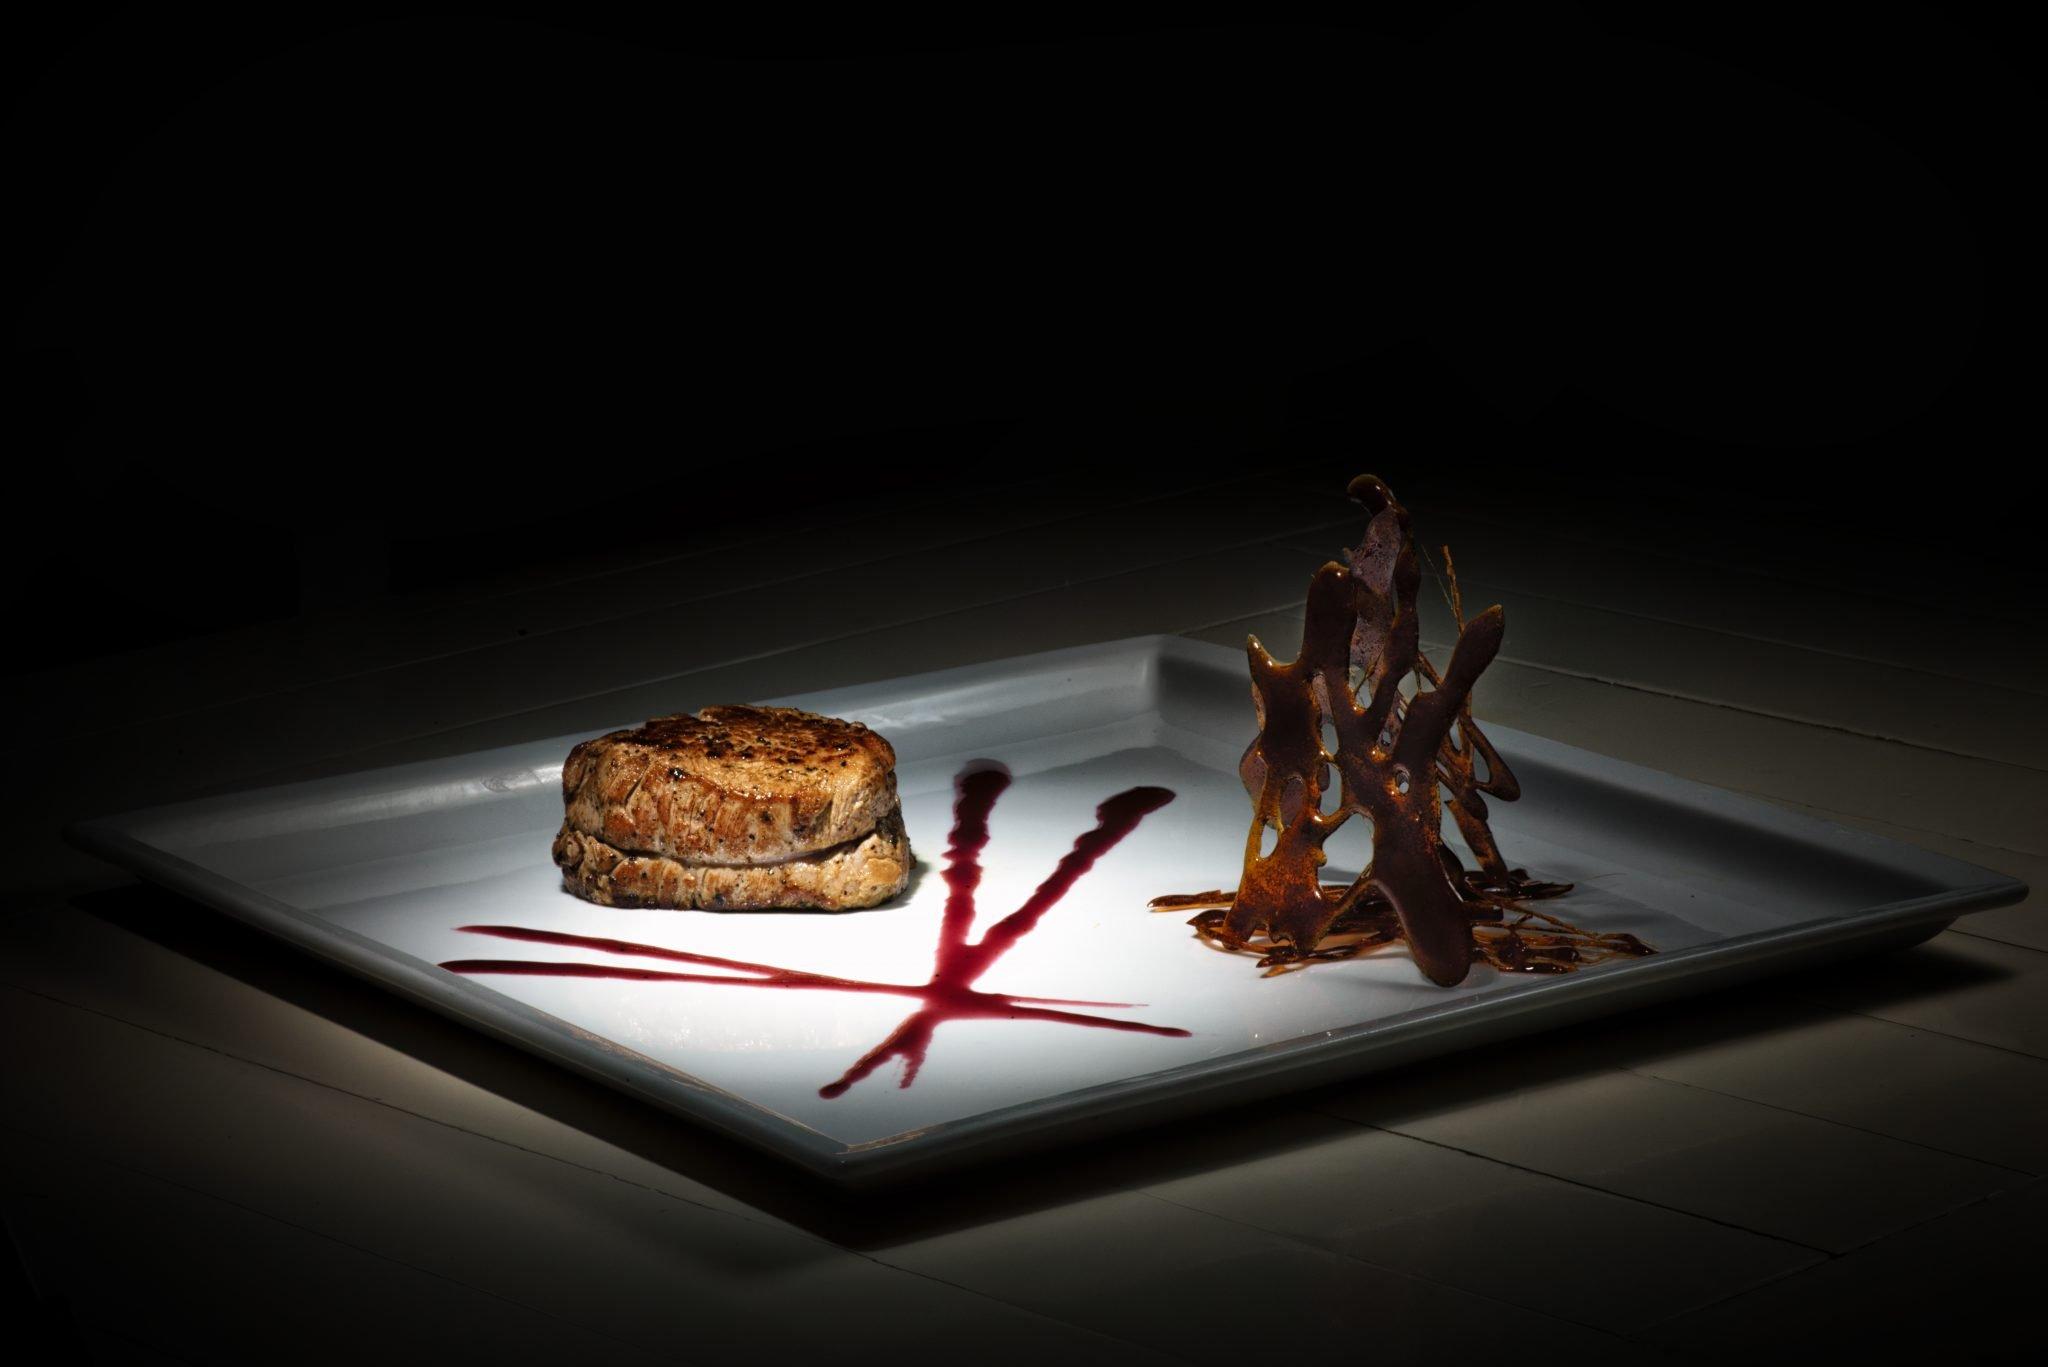 medaglioni filetto vitello anadima